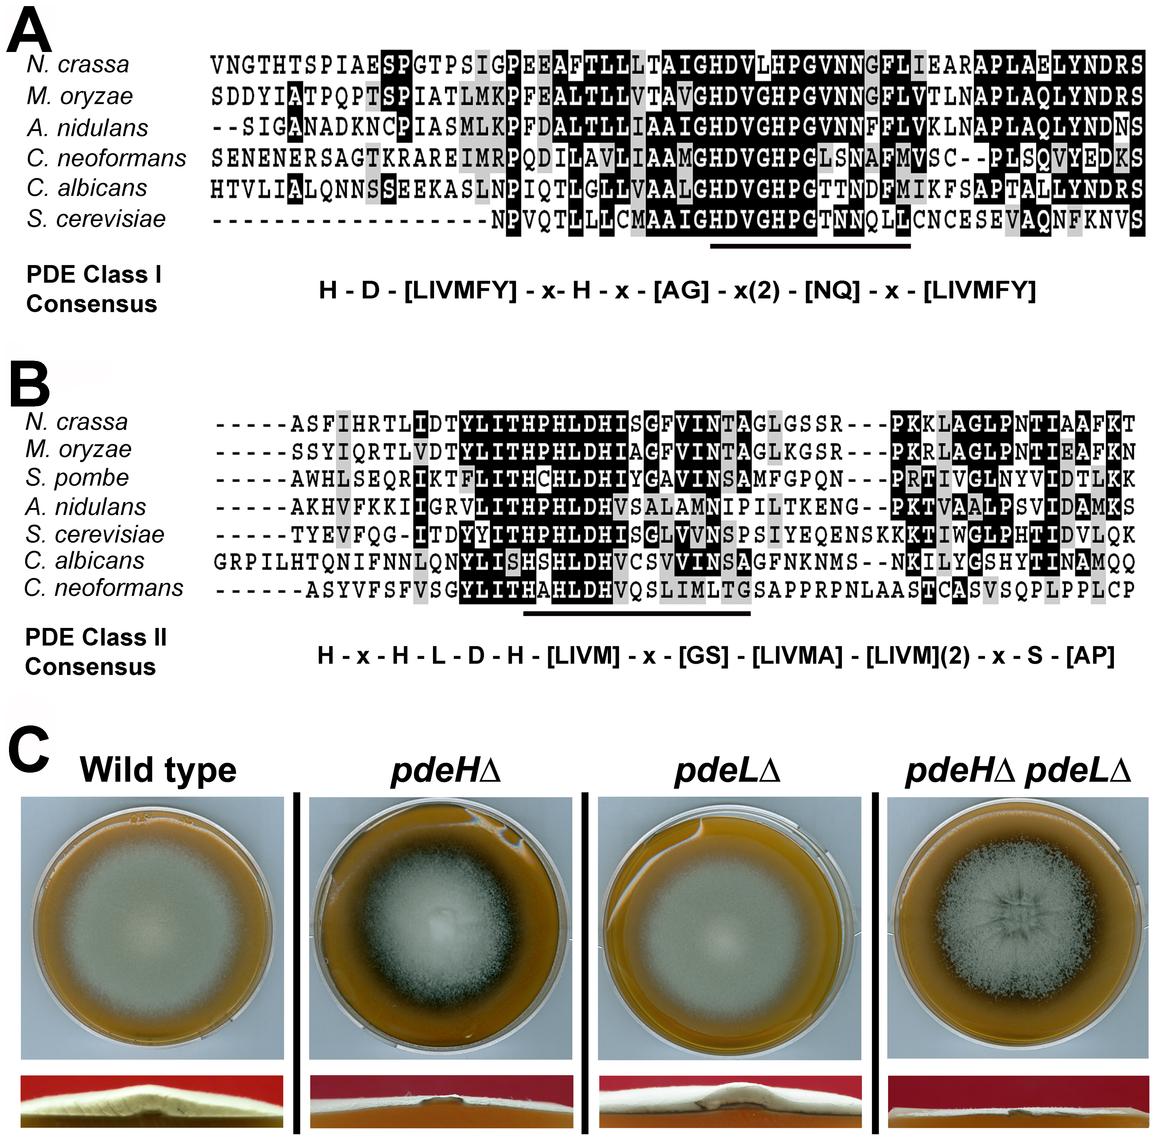 Identification and deletion analysis of cAMP phosphodiesterase genes in <i>M. oryzae</i>.